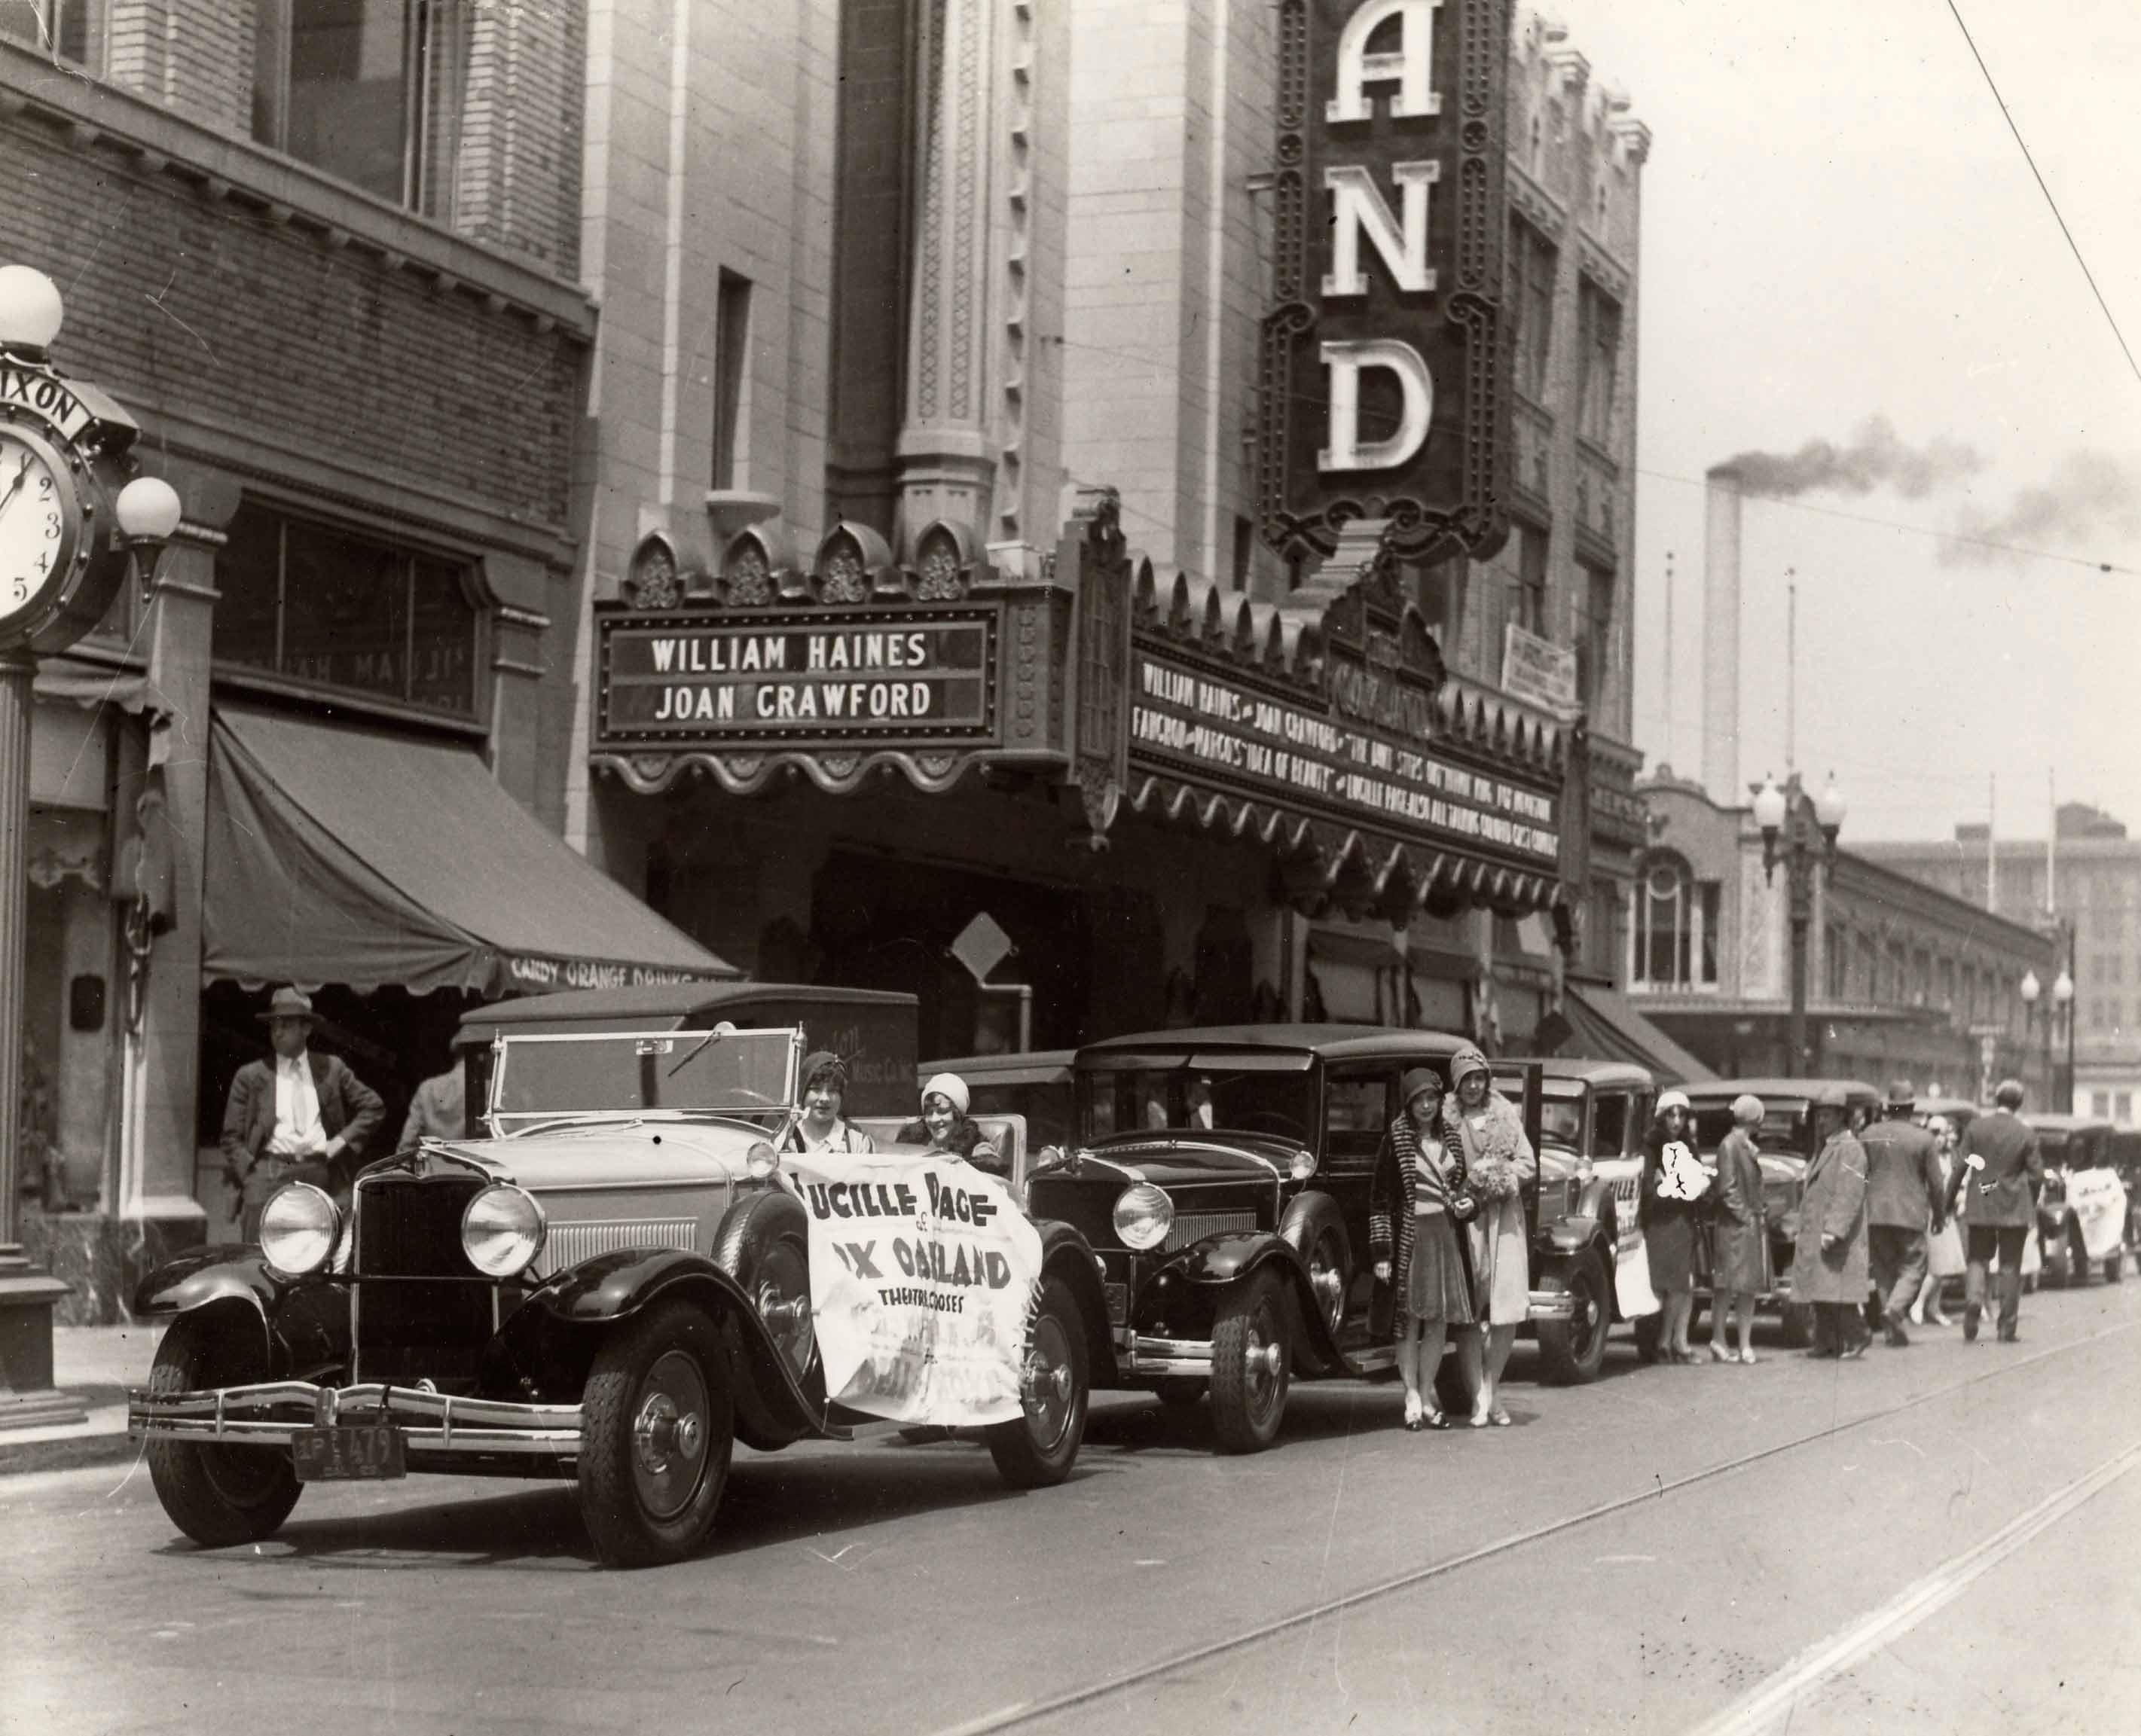 Mezzanine at Historic Oakland Fox Theater